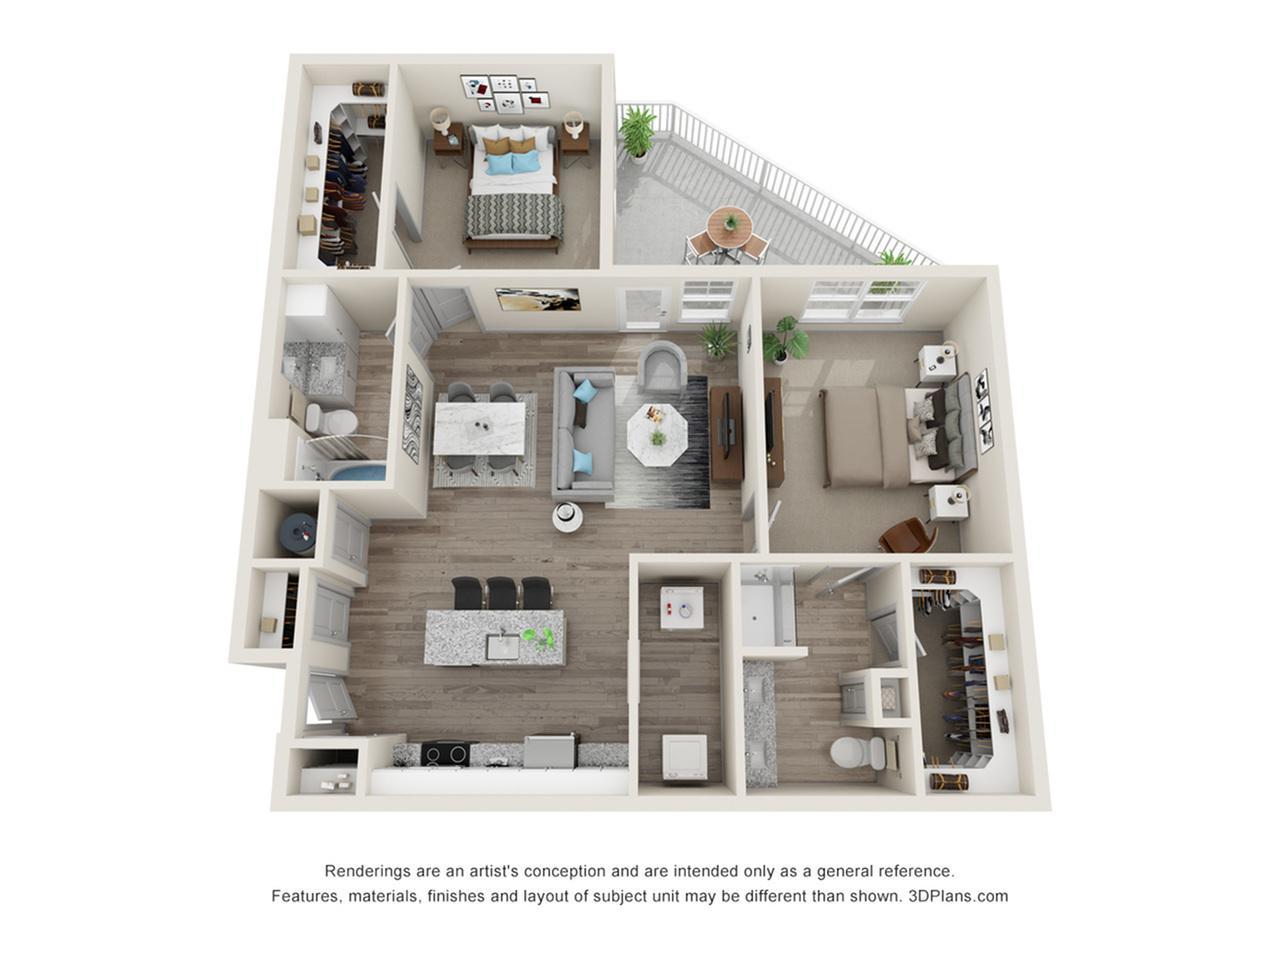 edge-floor-plan-2-bed-2-bath